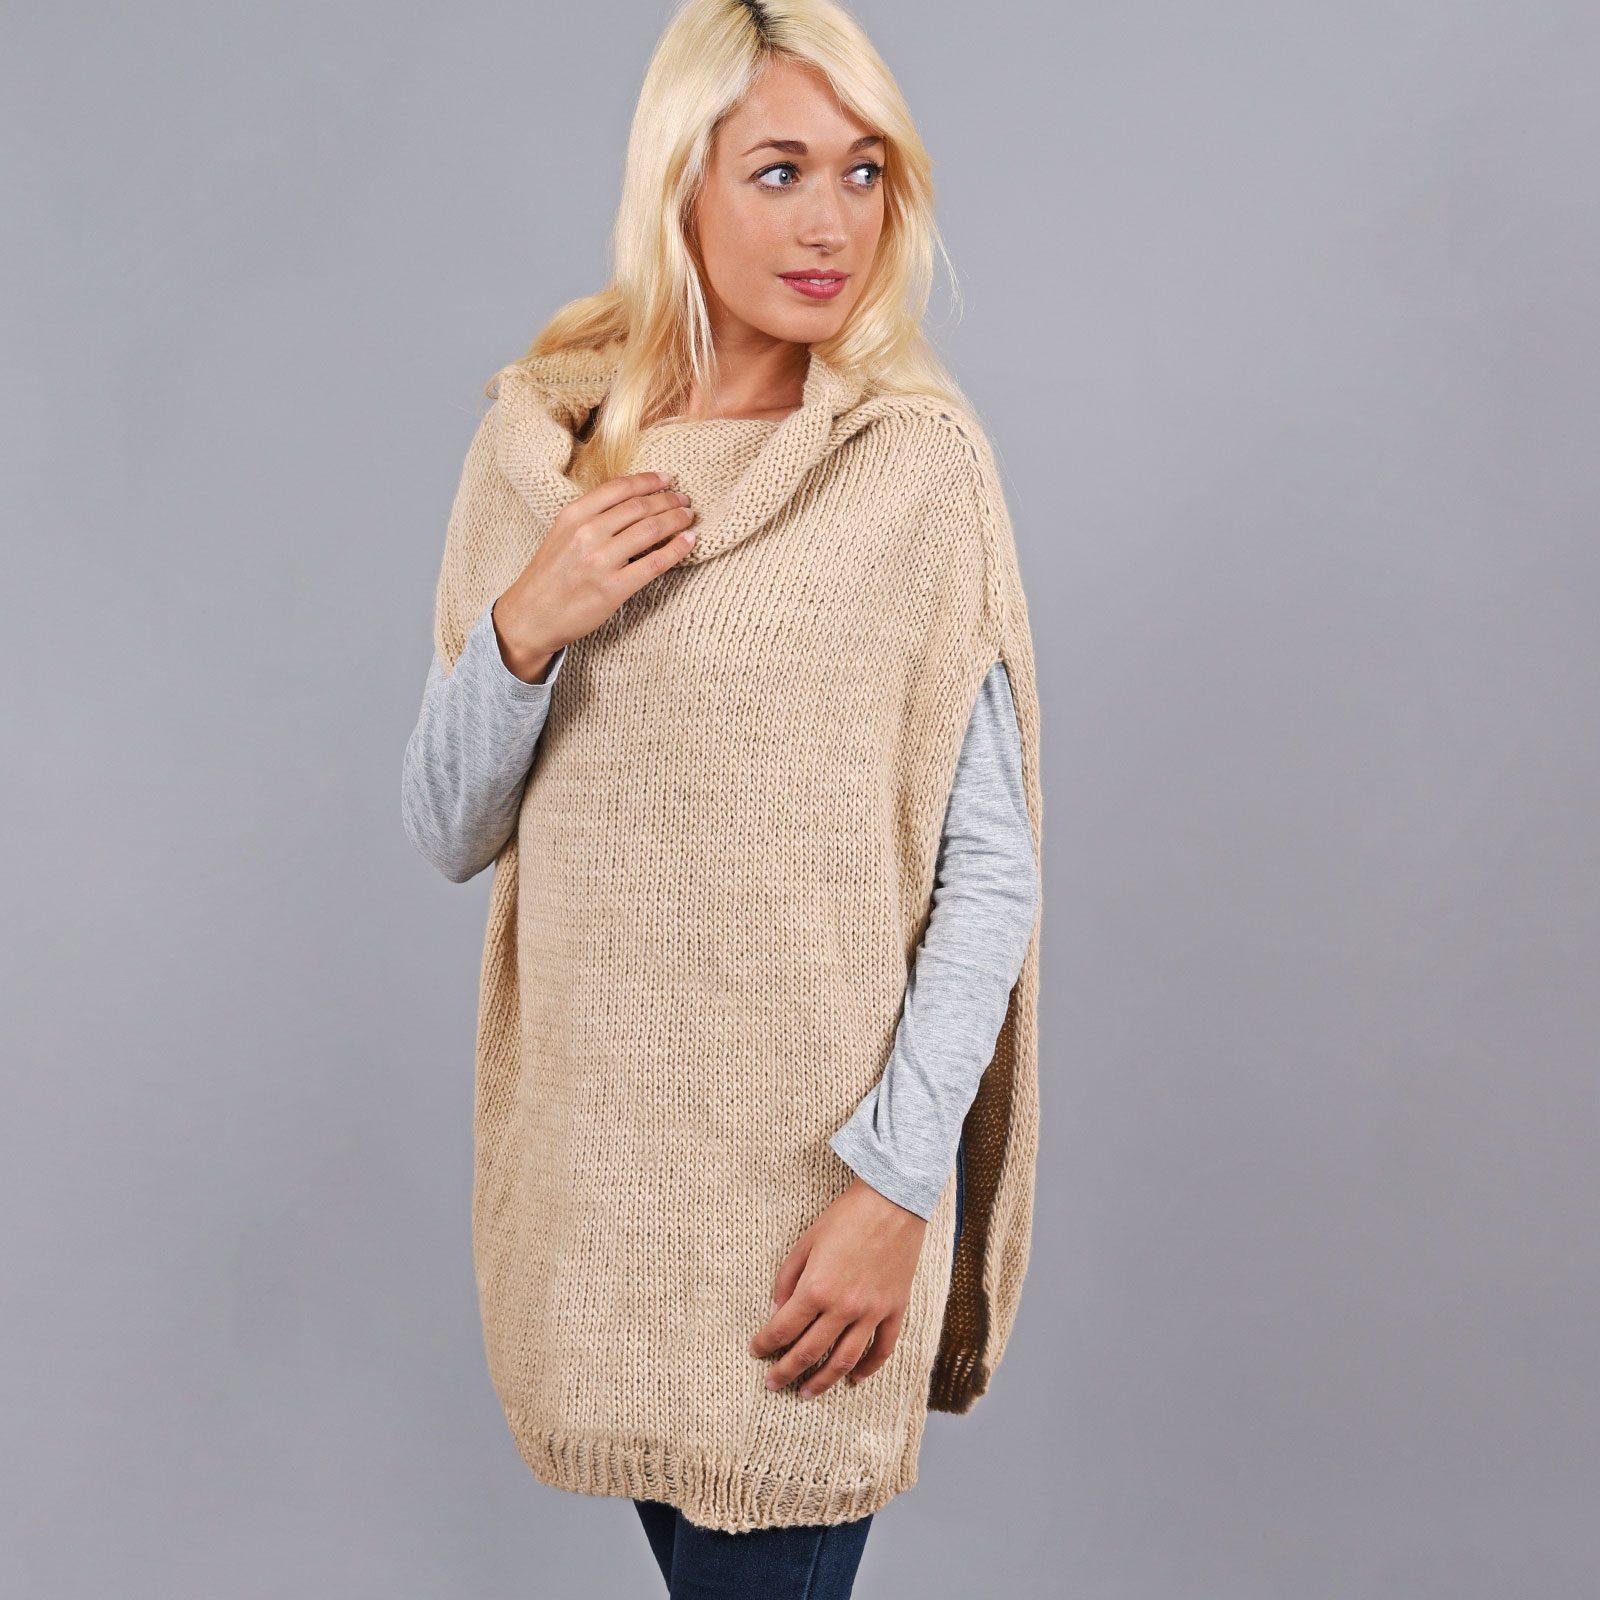 http://lookbook.allee-du-foulard.fr/wp-content/uploads/2019/01/AT-03159-VF16-poncho-col-roule-beige-1600x1600.jpg